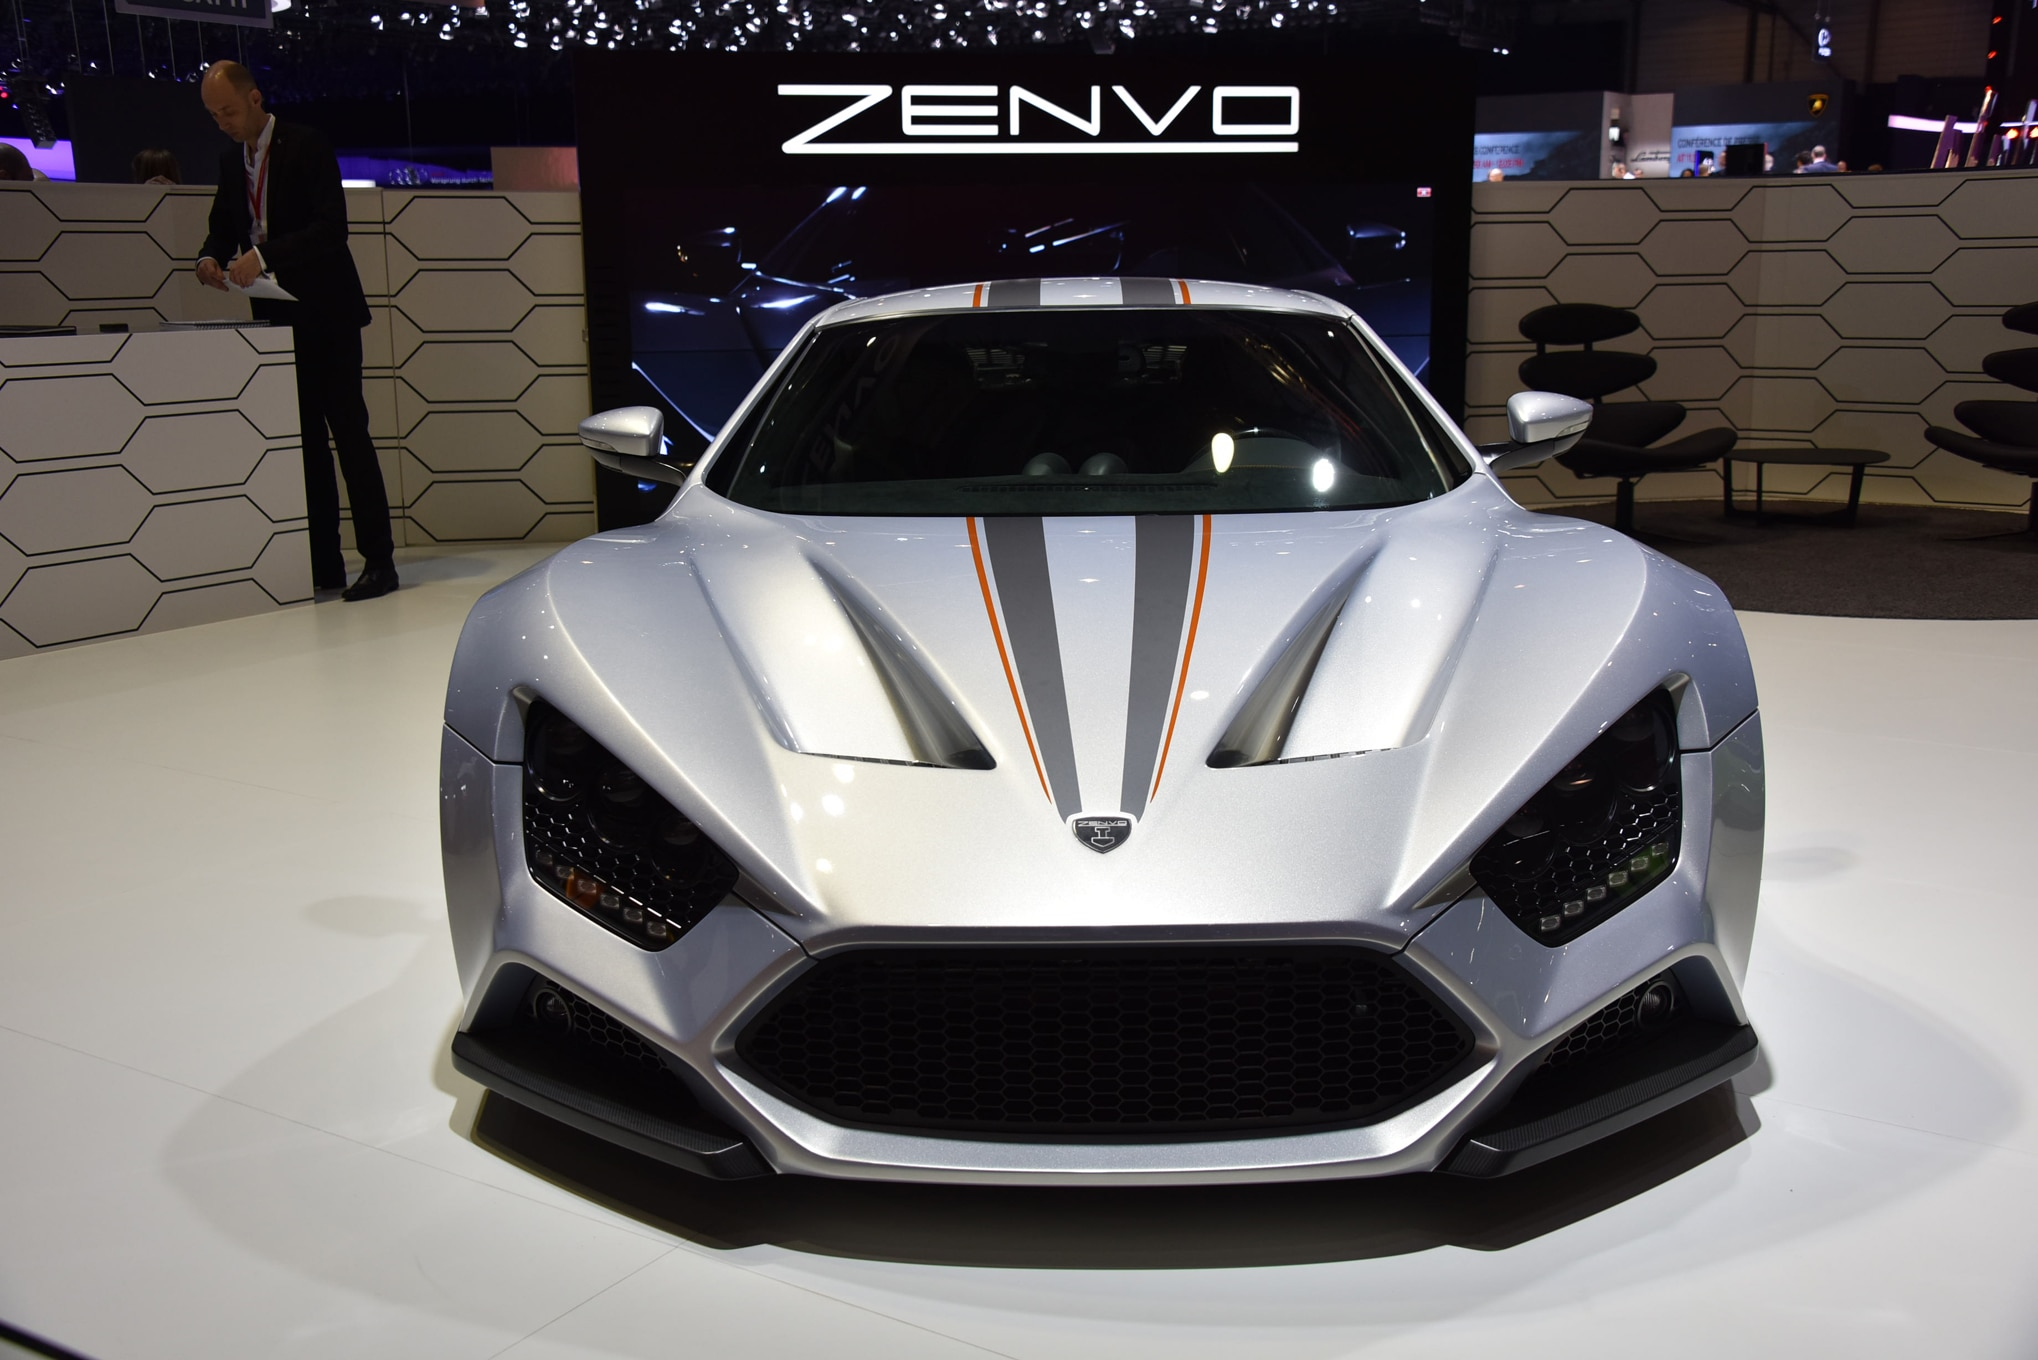 2015 Geneva Motor Show Hits, Misses And Revelations